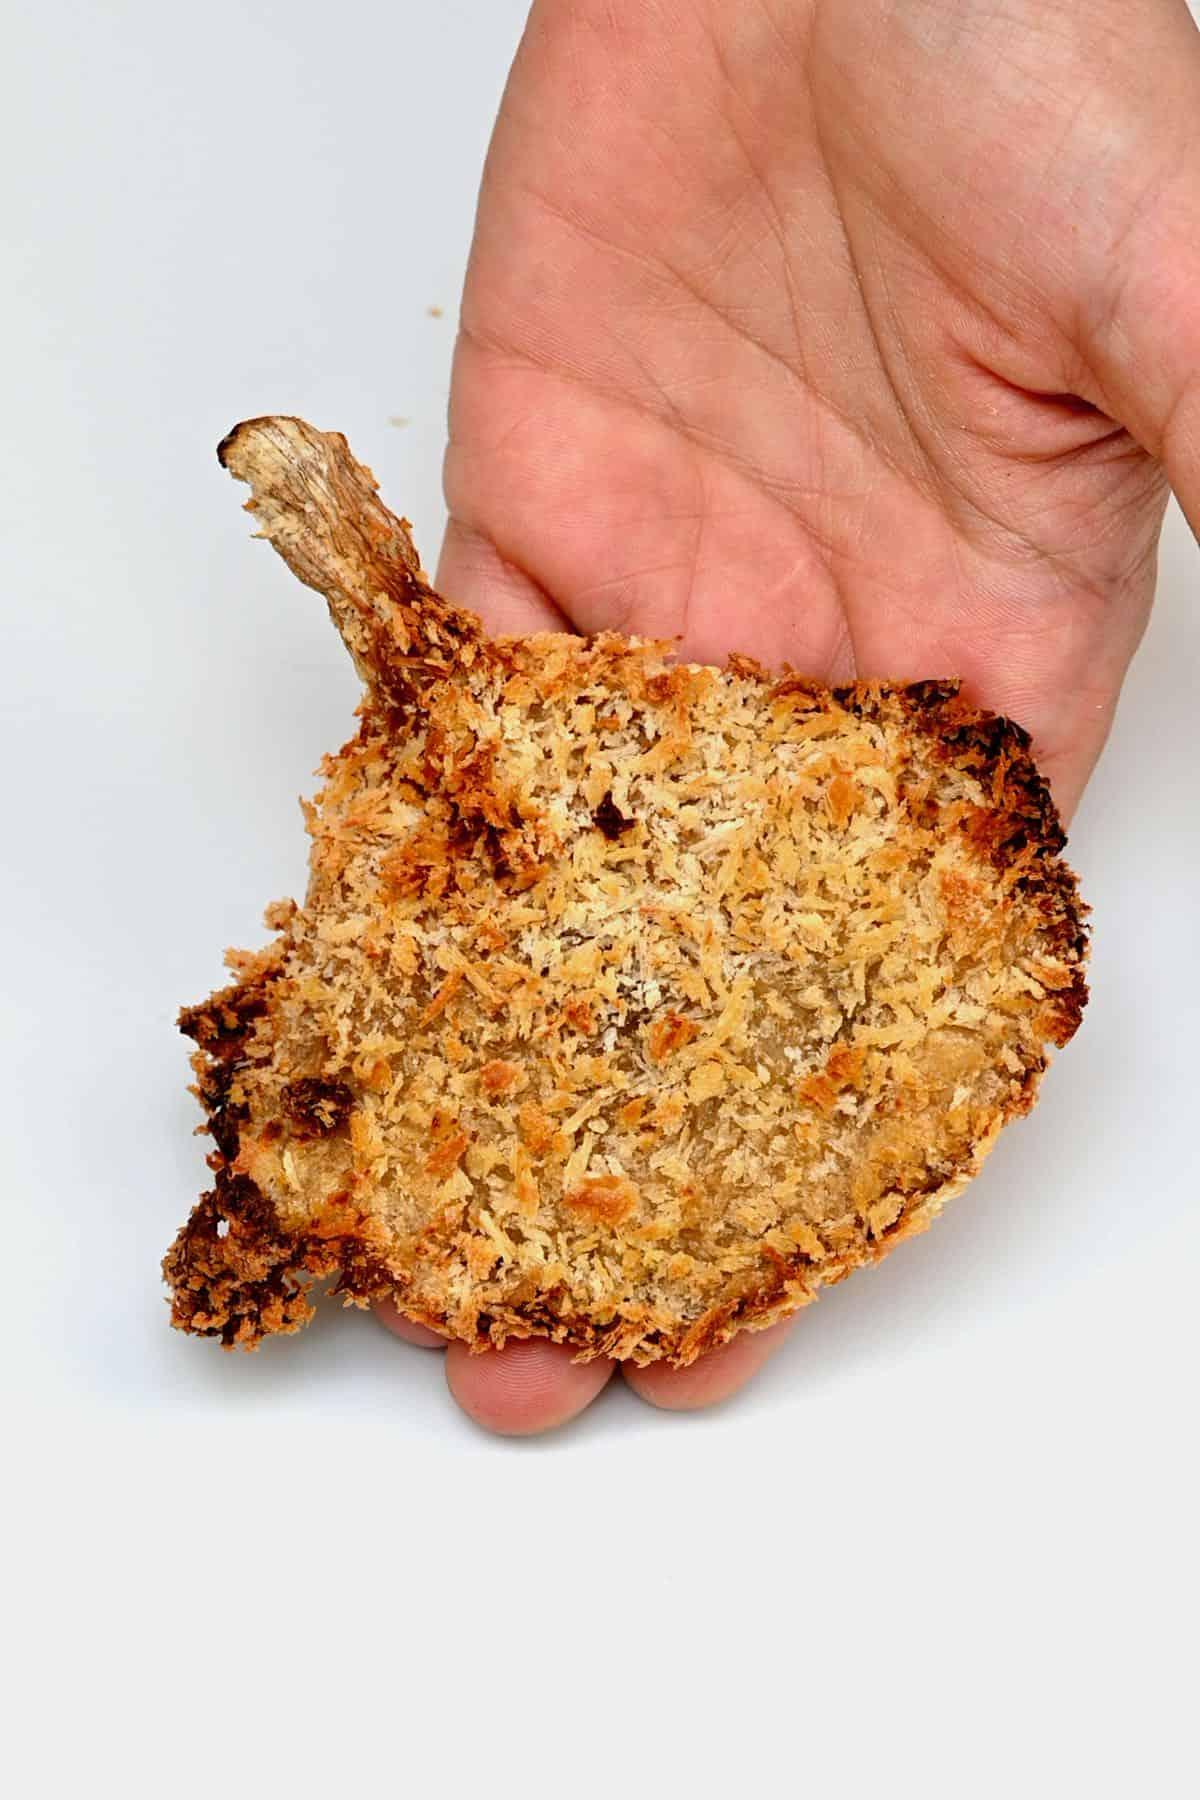 Hand holding crispy oyster mushroom